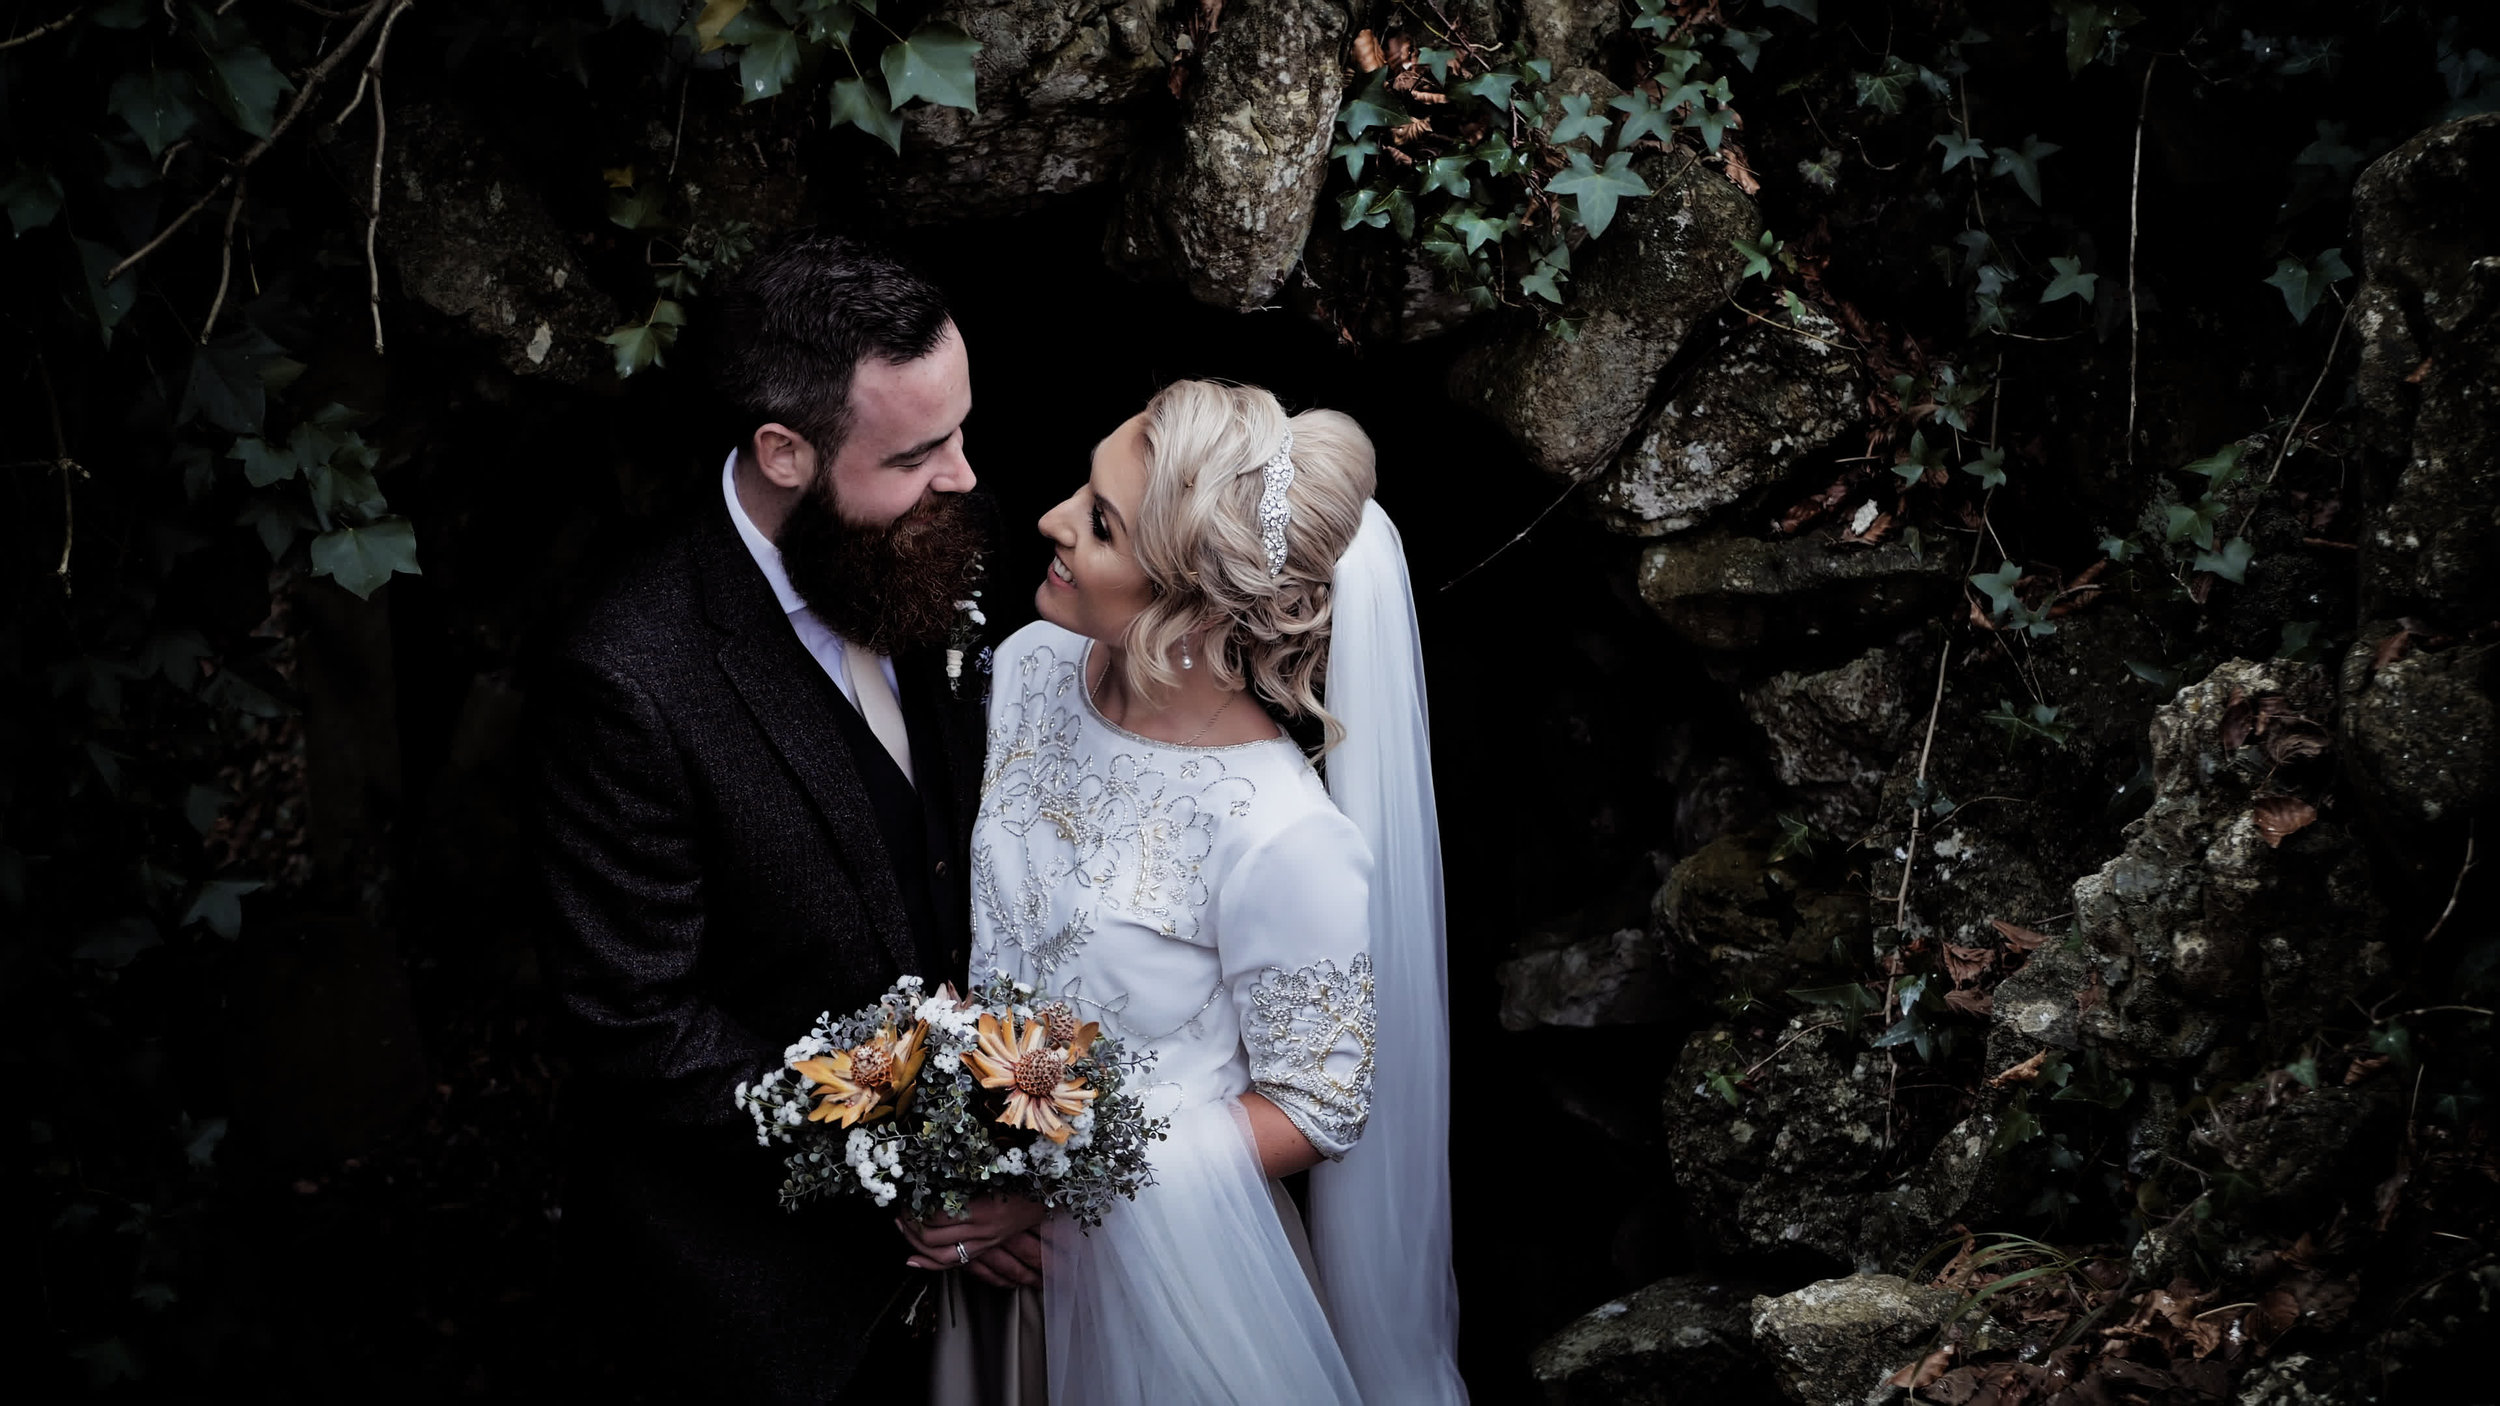 ciara-ken-wedding-video-castle-durrow.jpg